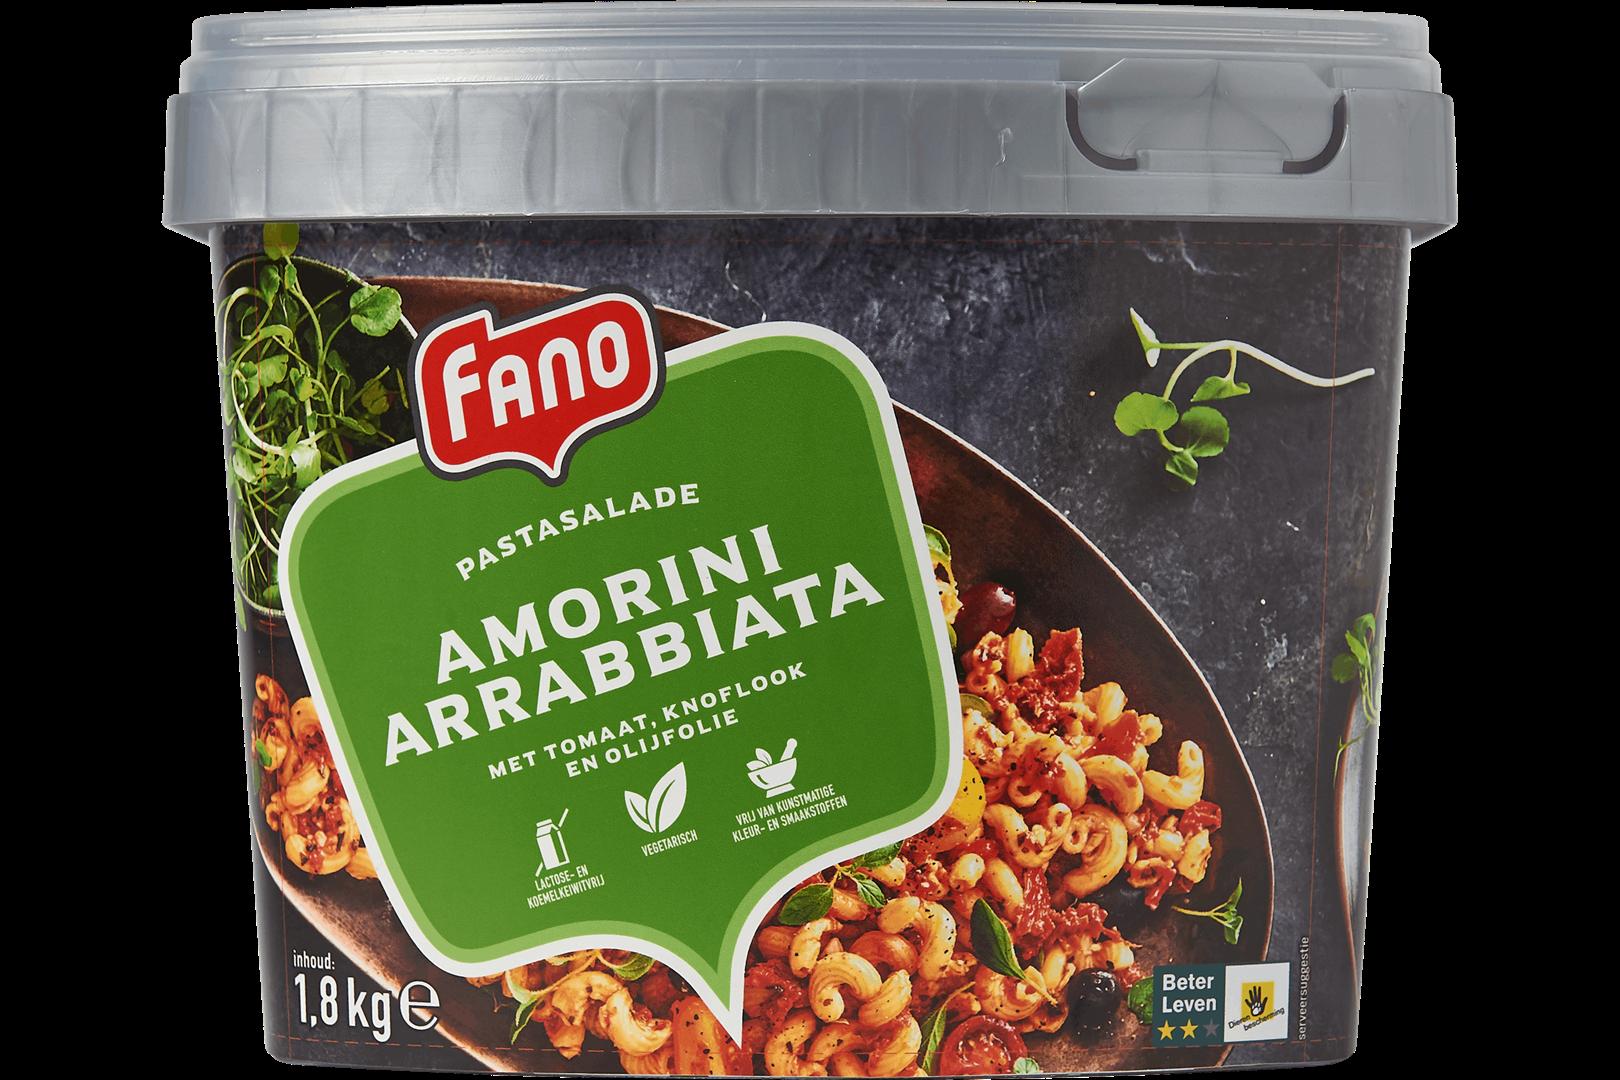 Productafbeelding FANO Pastasalade Arrabbiata 1,8kg